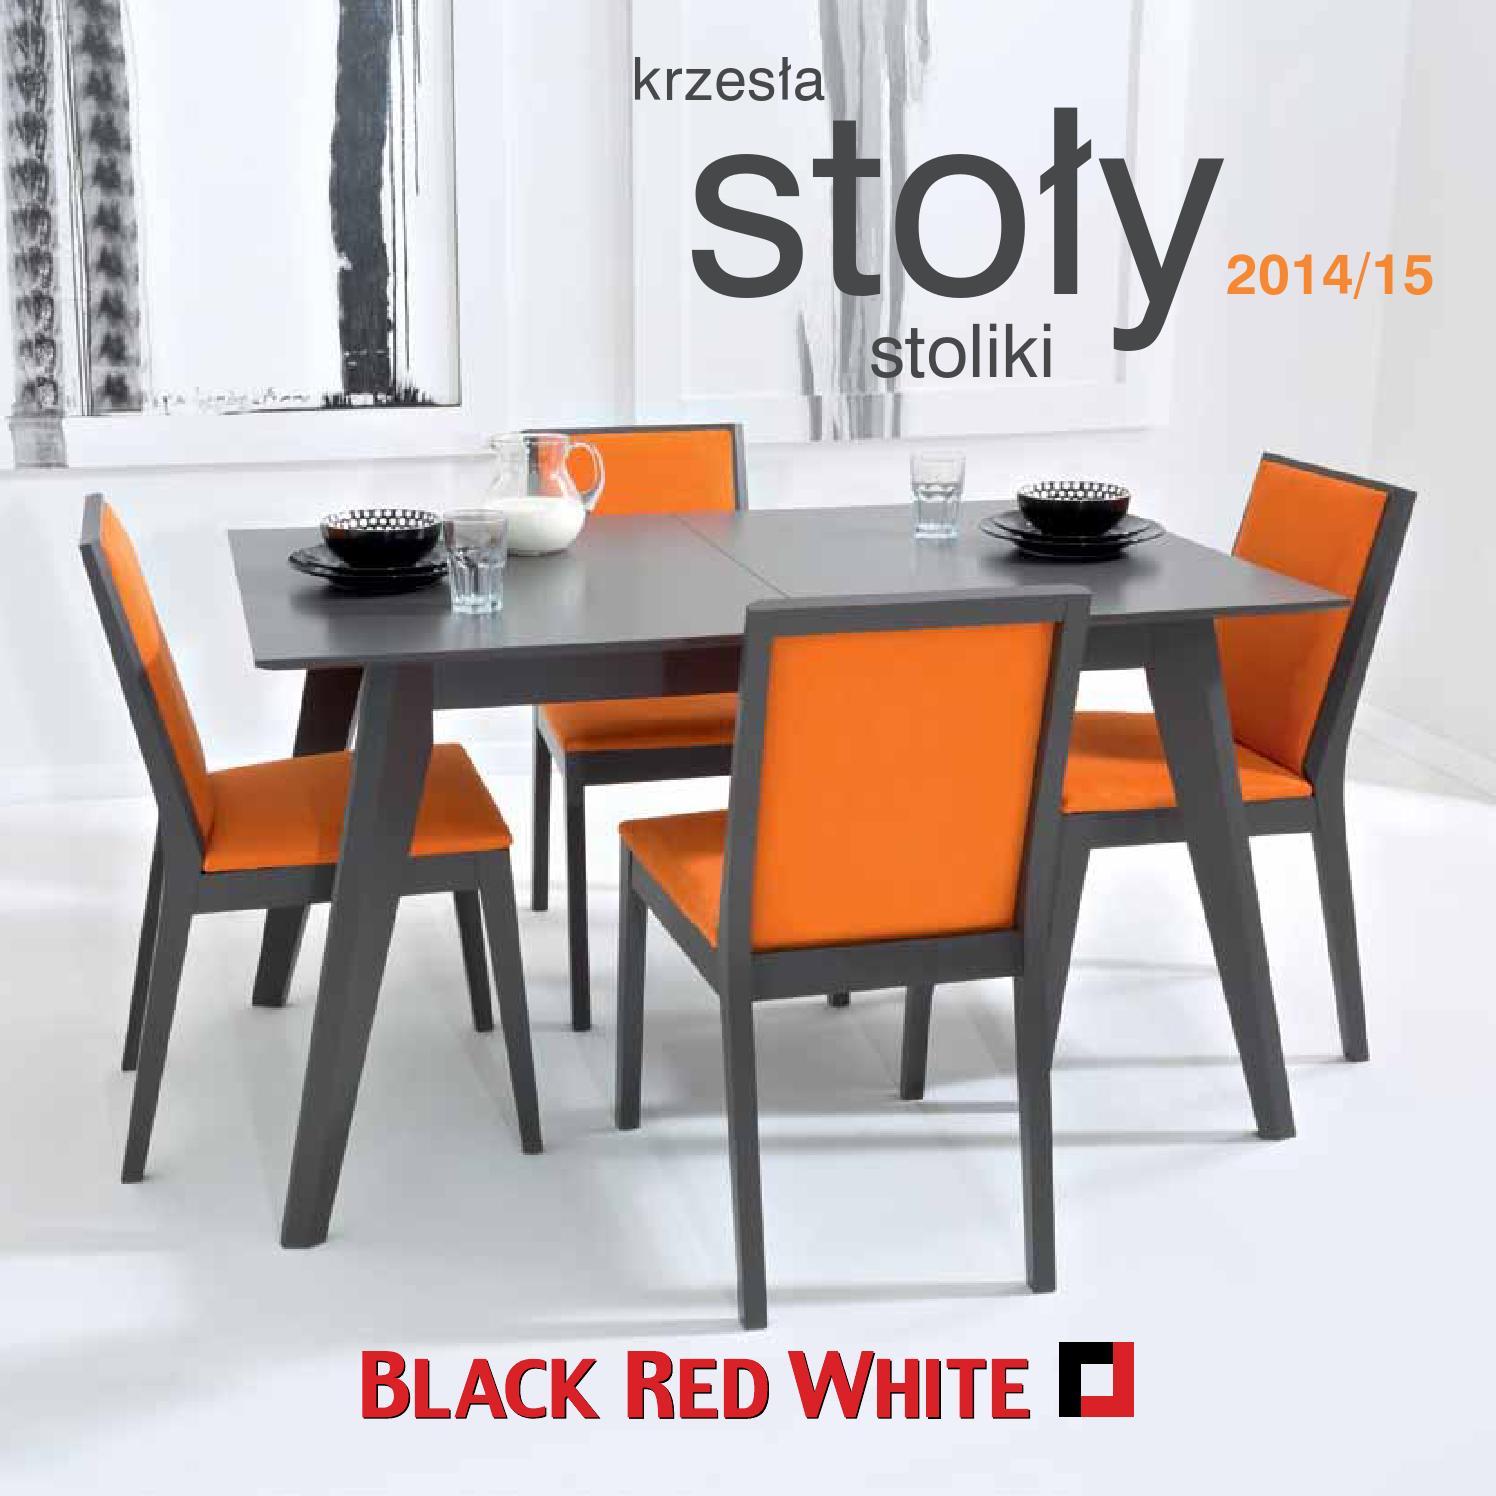 Katalog Brw Krzesla Stoly 2014 15 By Finmarket Issuu